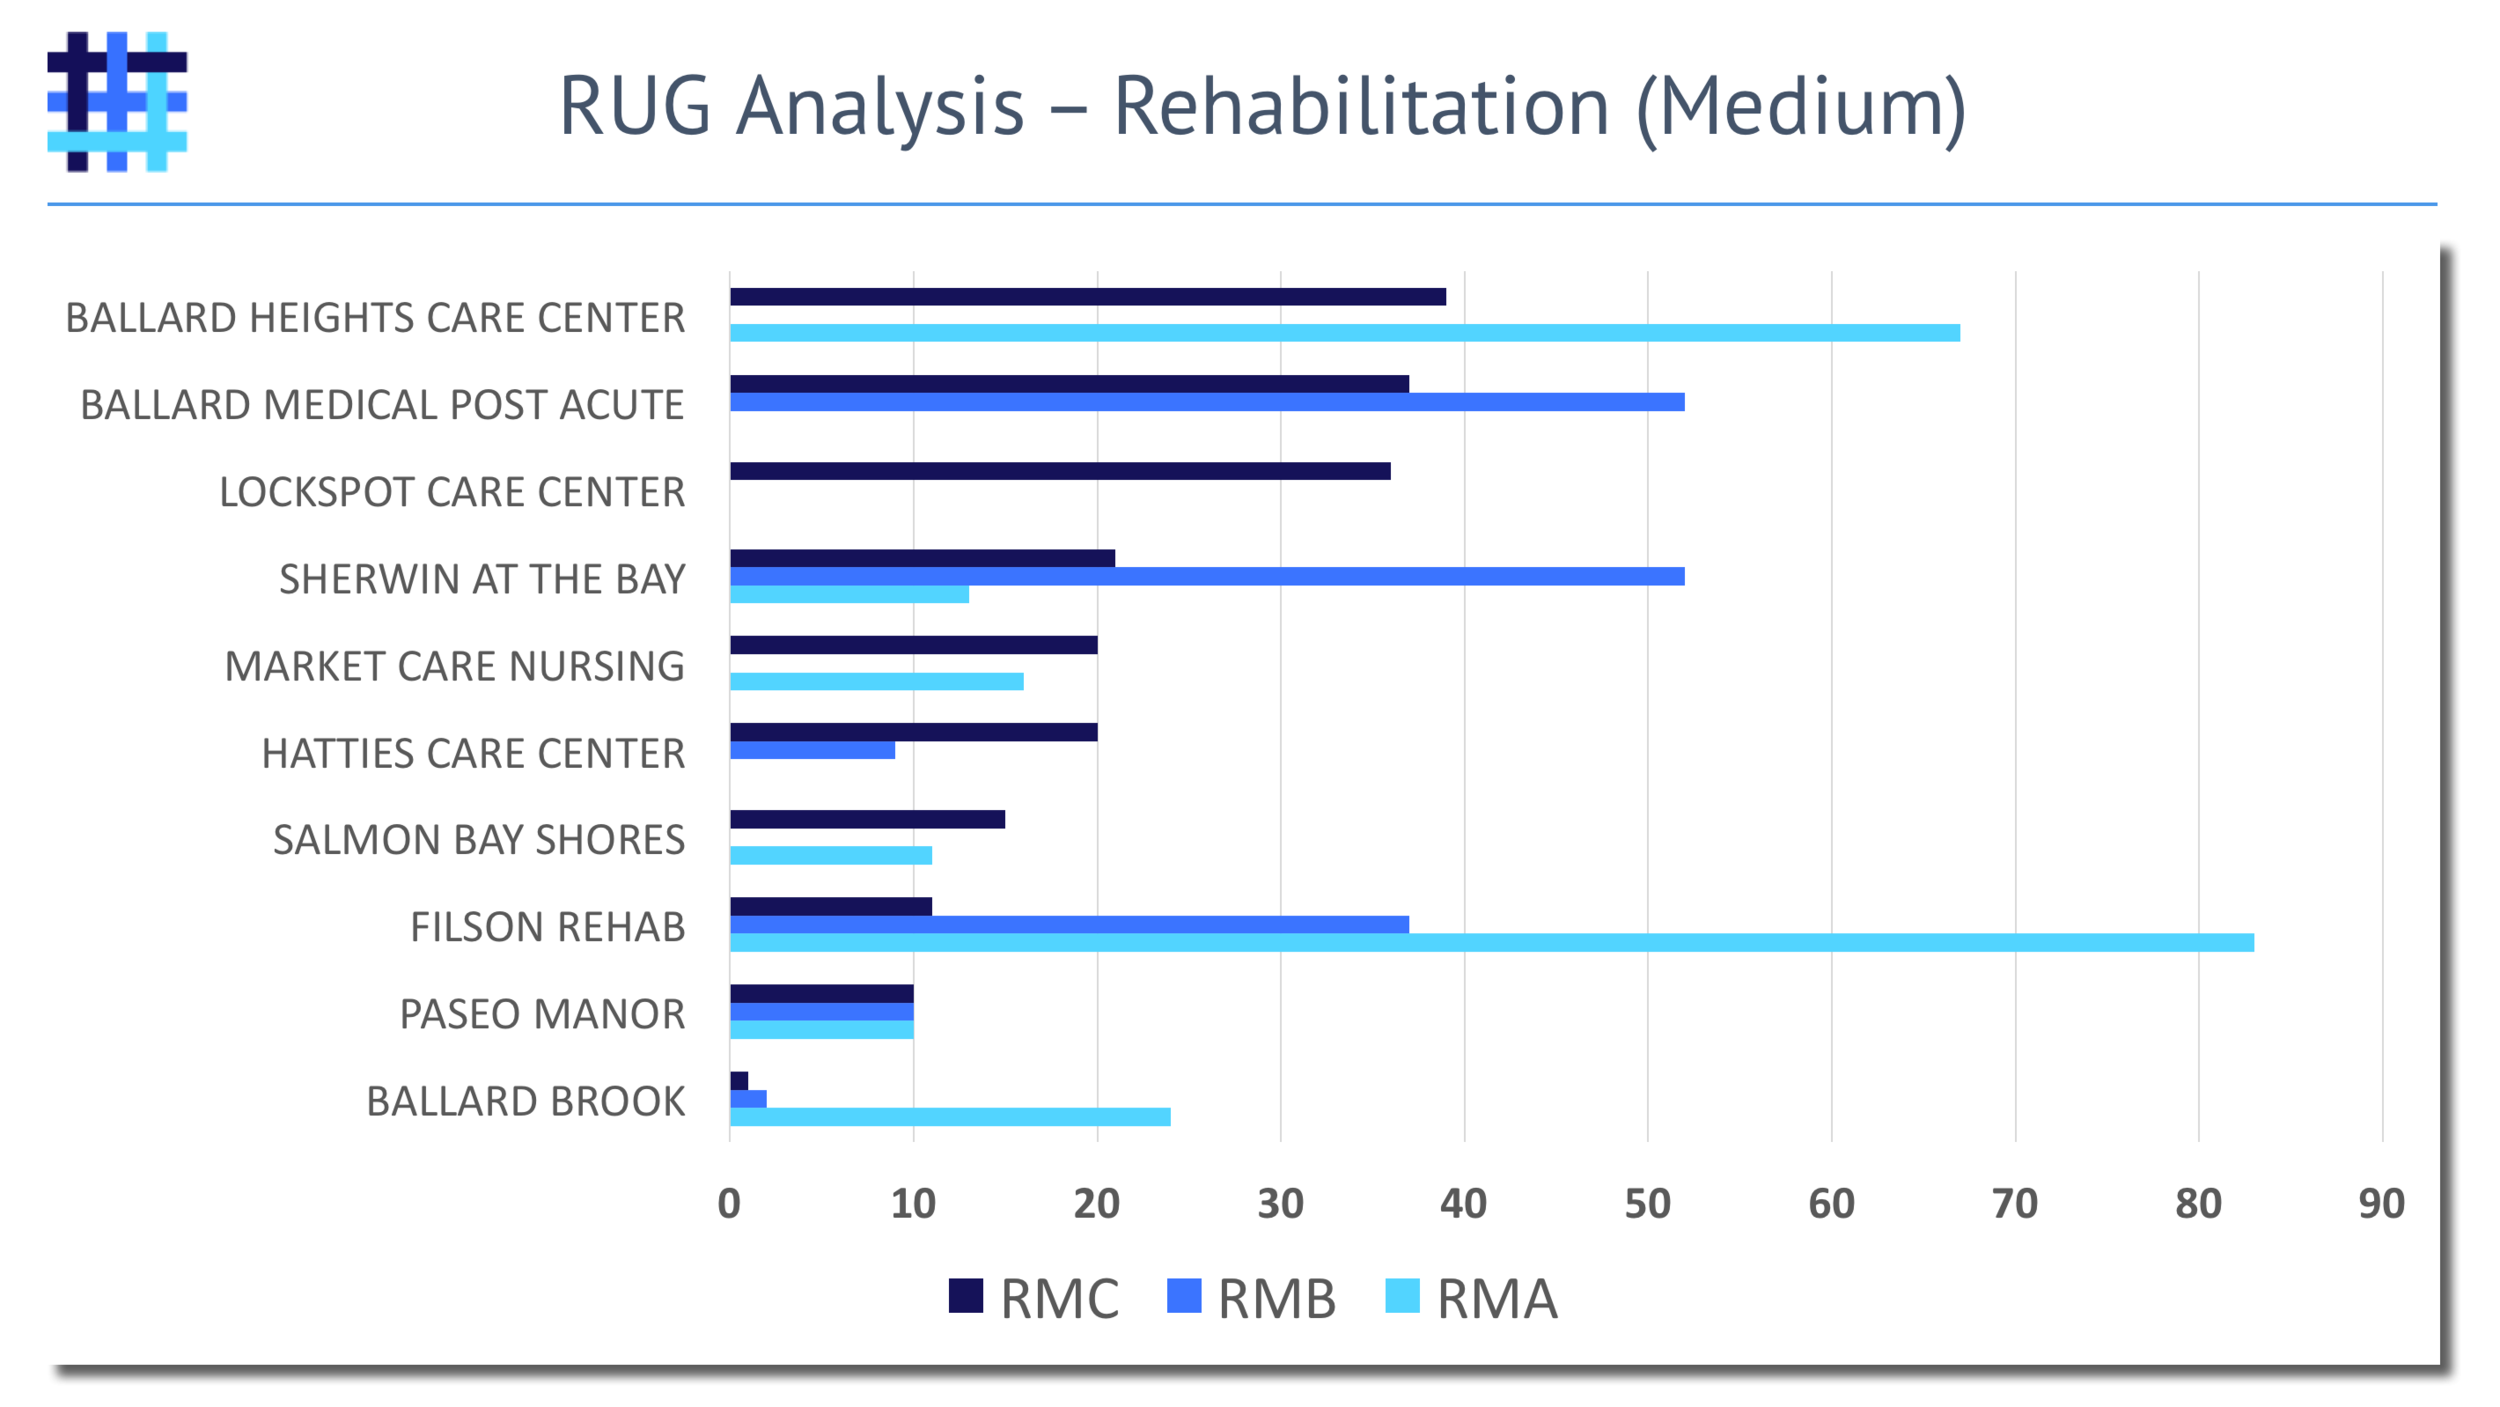 Nursing Home Resource Utilization Group (RUG) Analysis - Rehabilitation - Medium